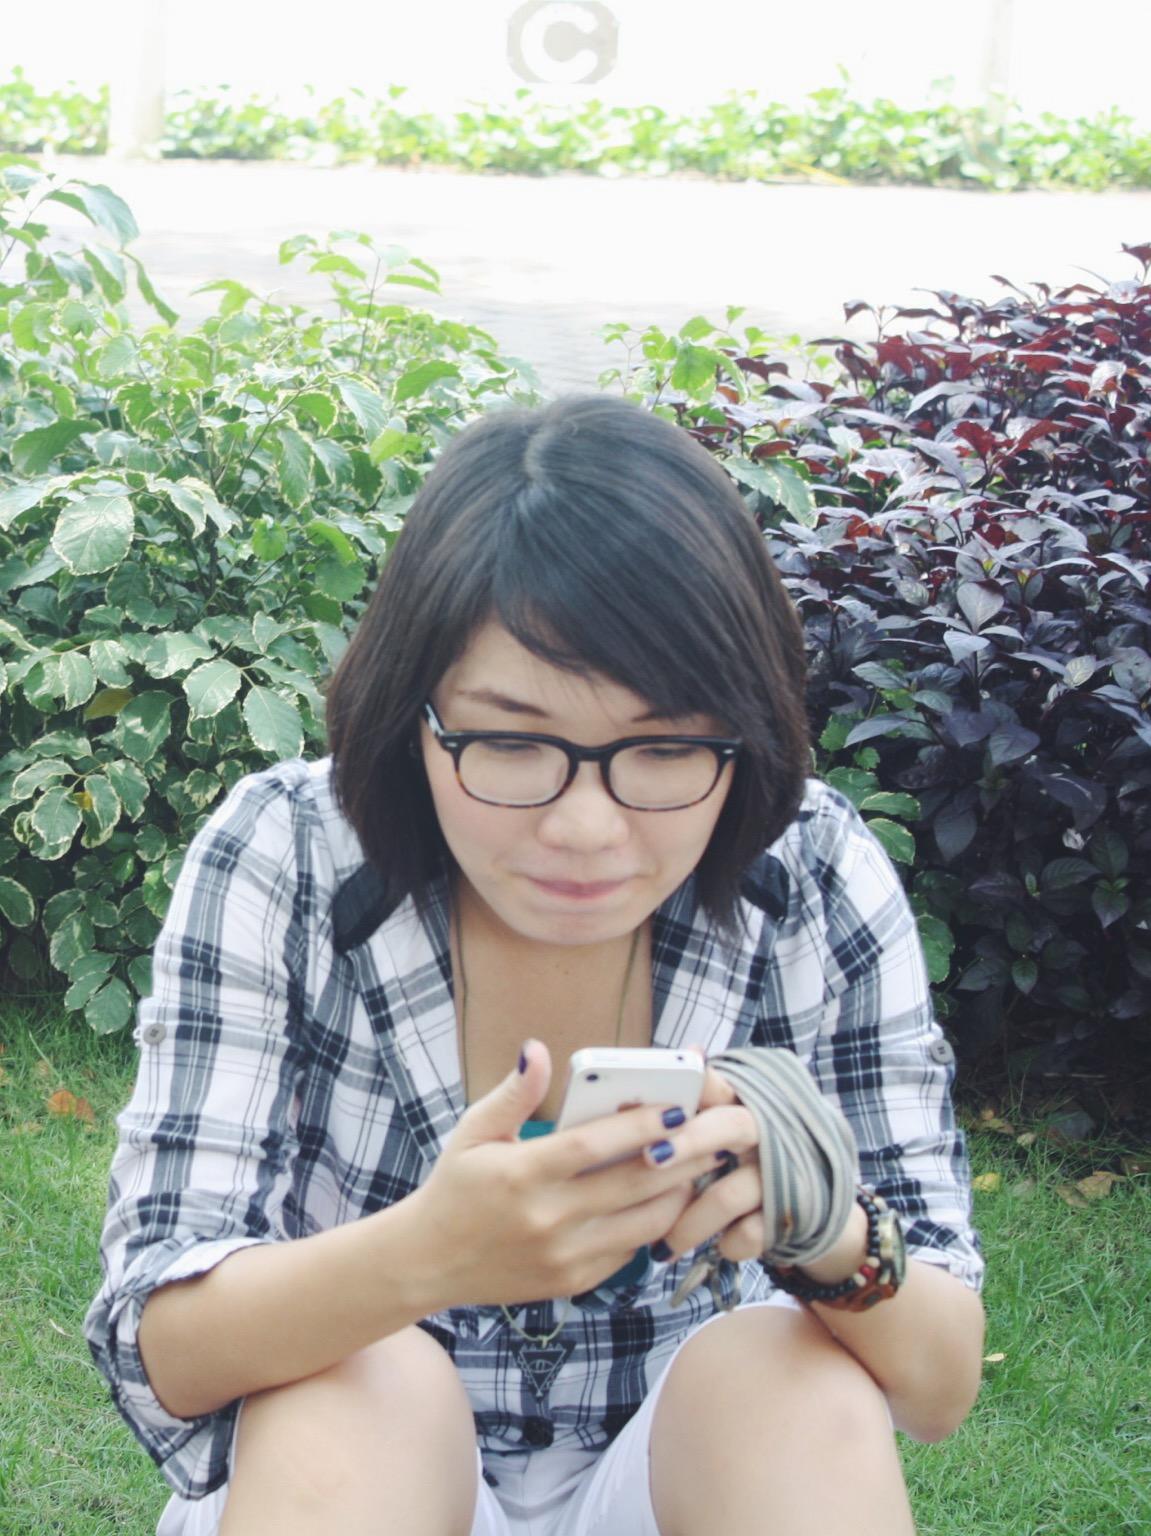 Vo Thi Kim Tien – 2 Years Marketing/Social Media